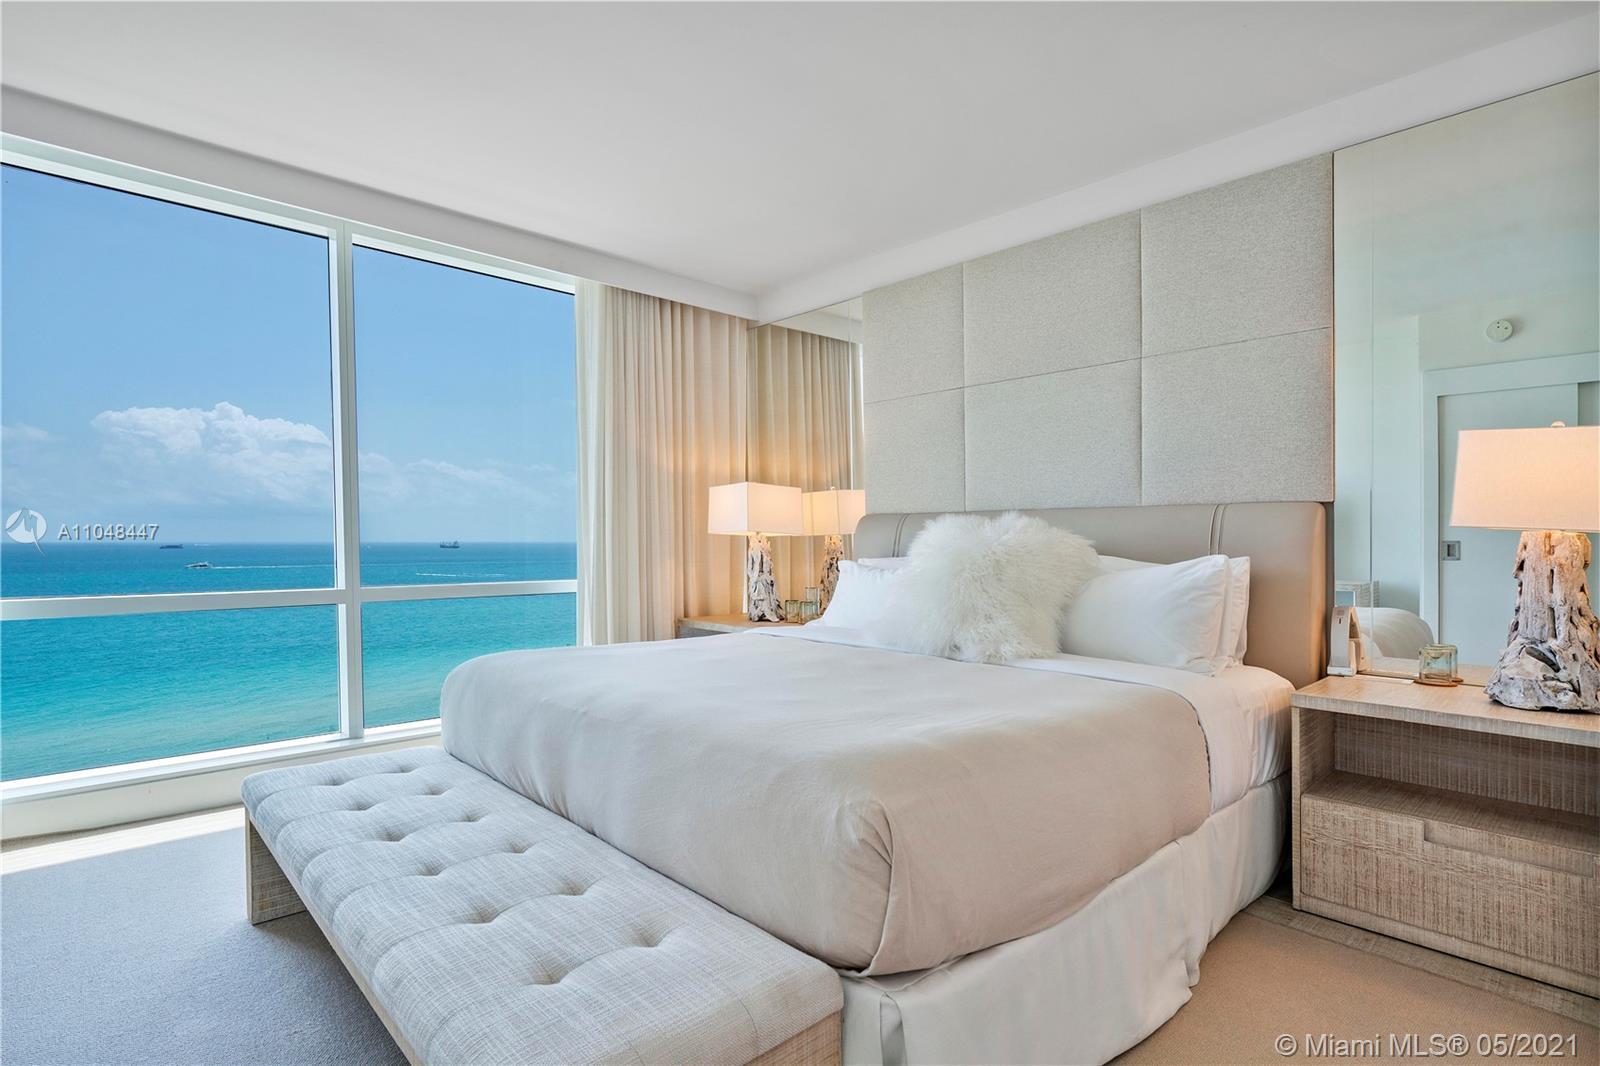 1 Hotel & Homes #1519 - 102 24th St #1519, Miami Beach, FL 33139